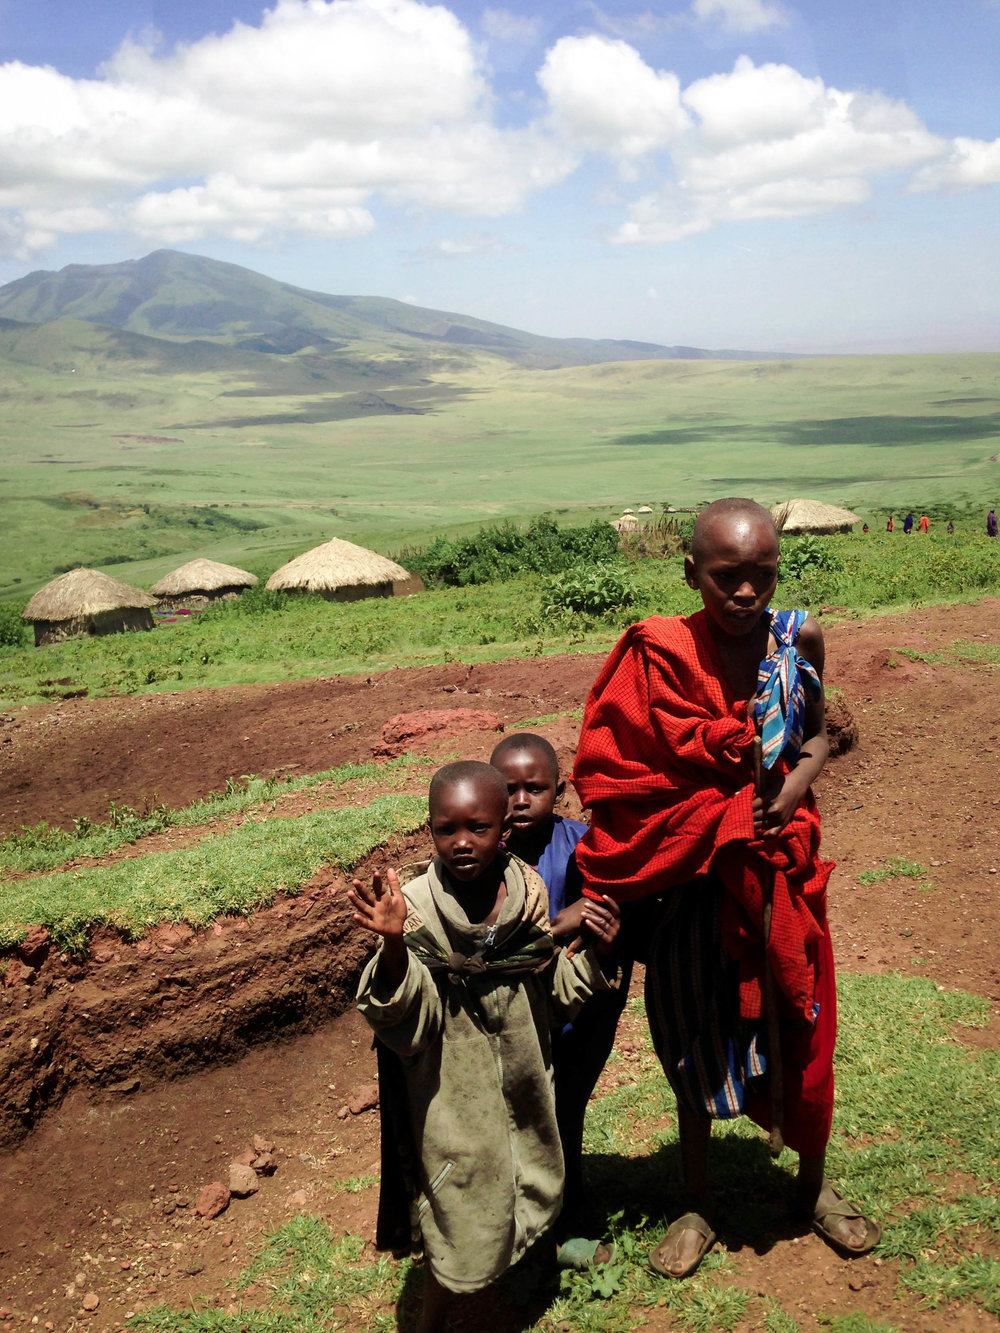 tanzanian boys wakanda traveling fro.jpg